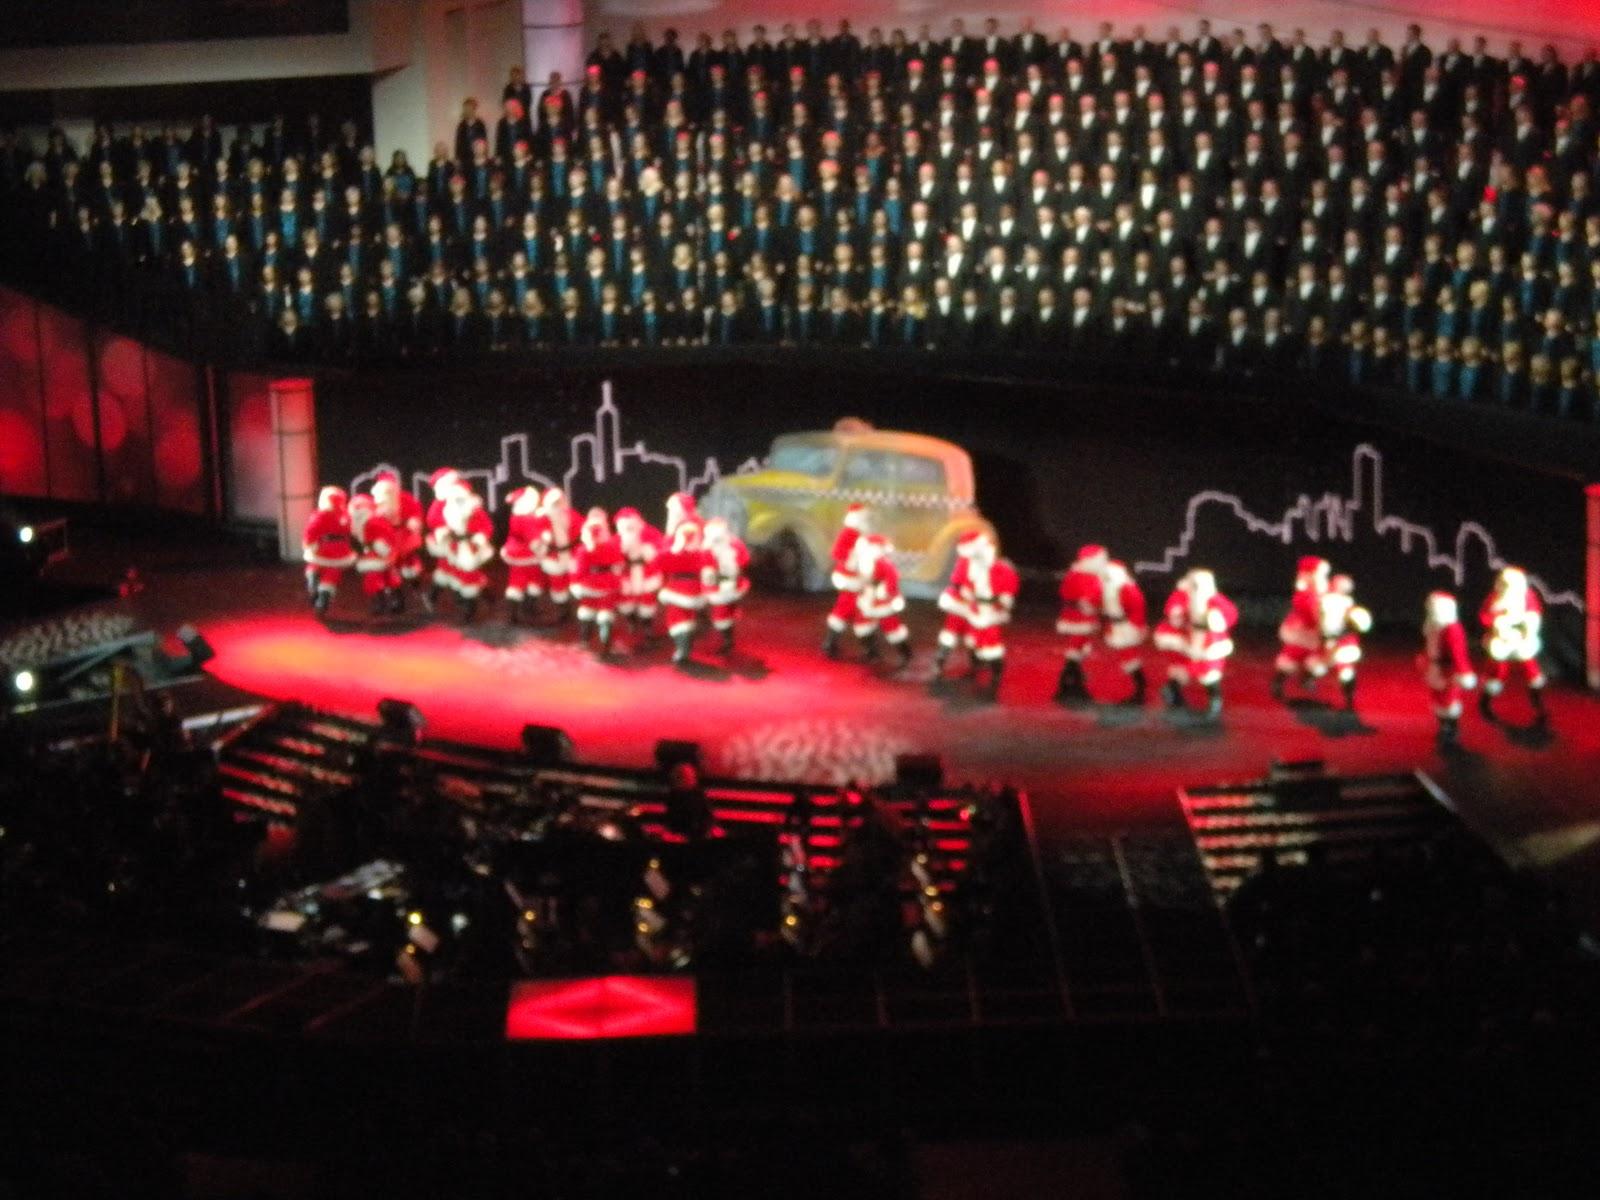 Prestonwood Christmas Show.Blog Archives Goovegalo